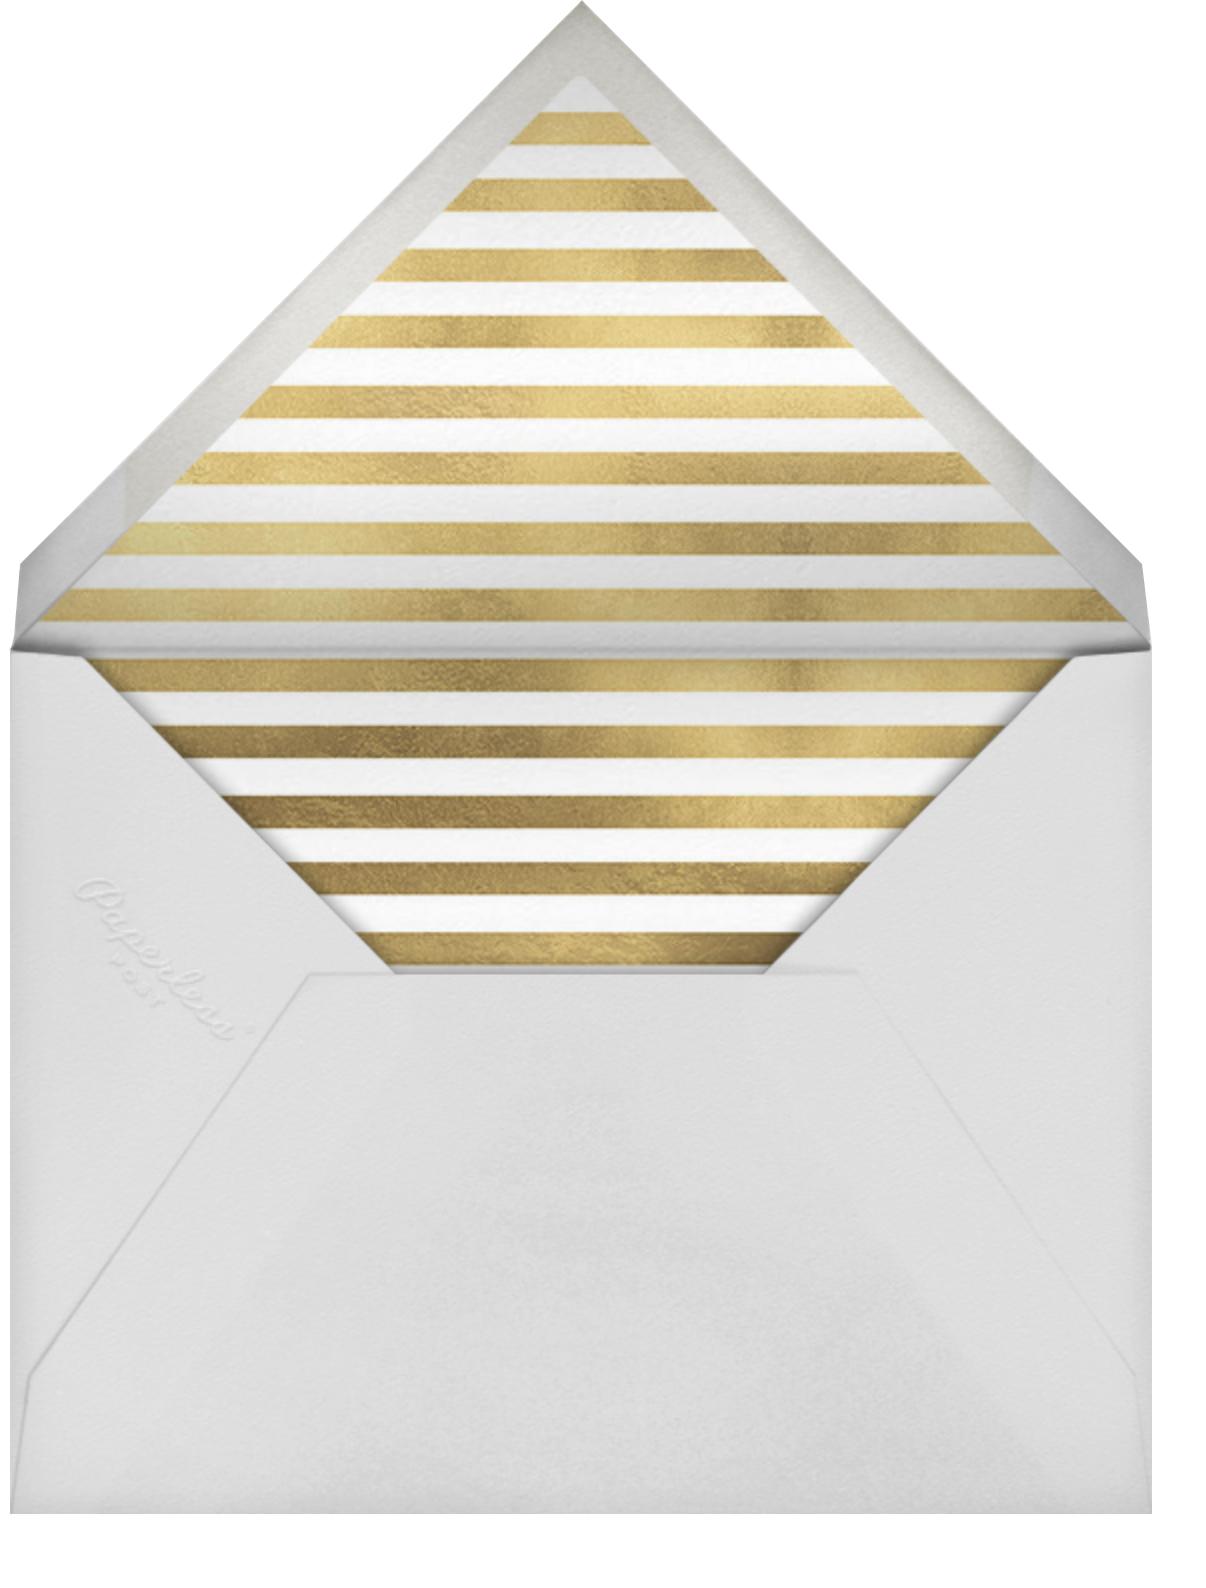 Come Celebrate - Ivory/Gold - kate spade new york - Birthday - envelope back